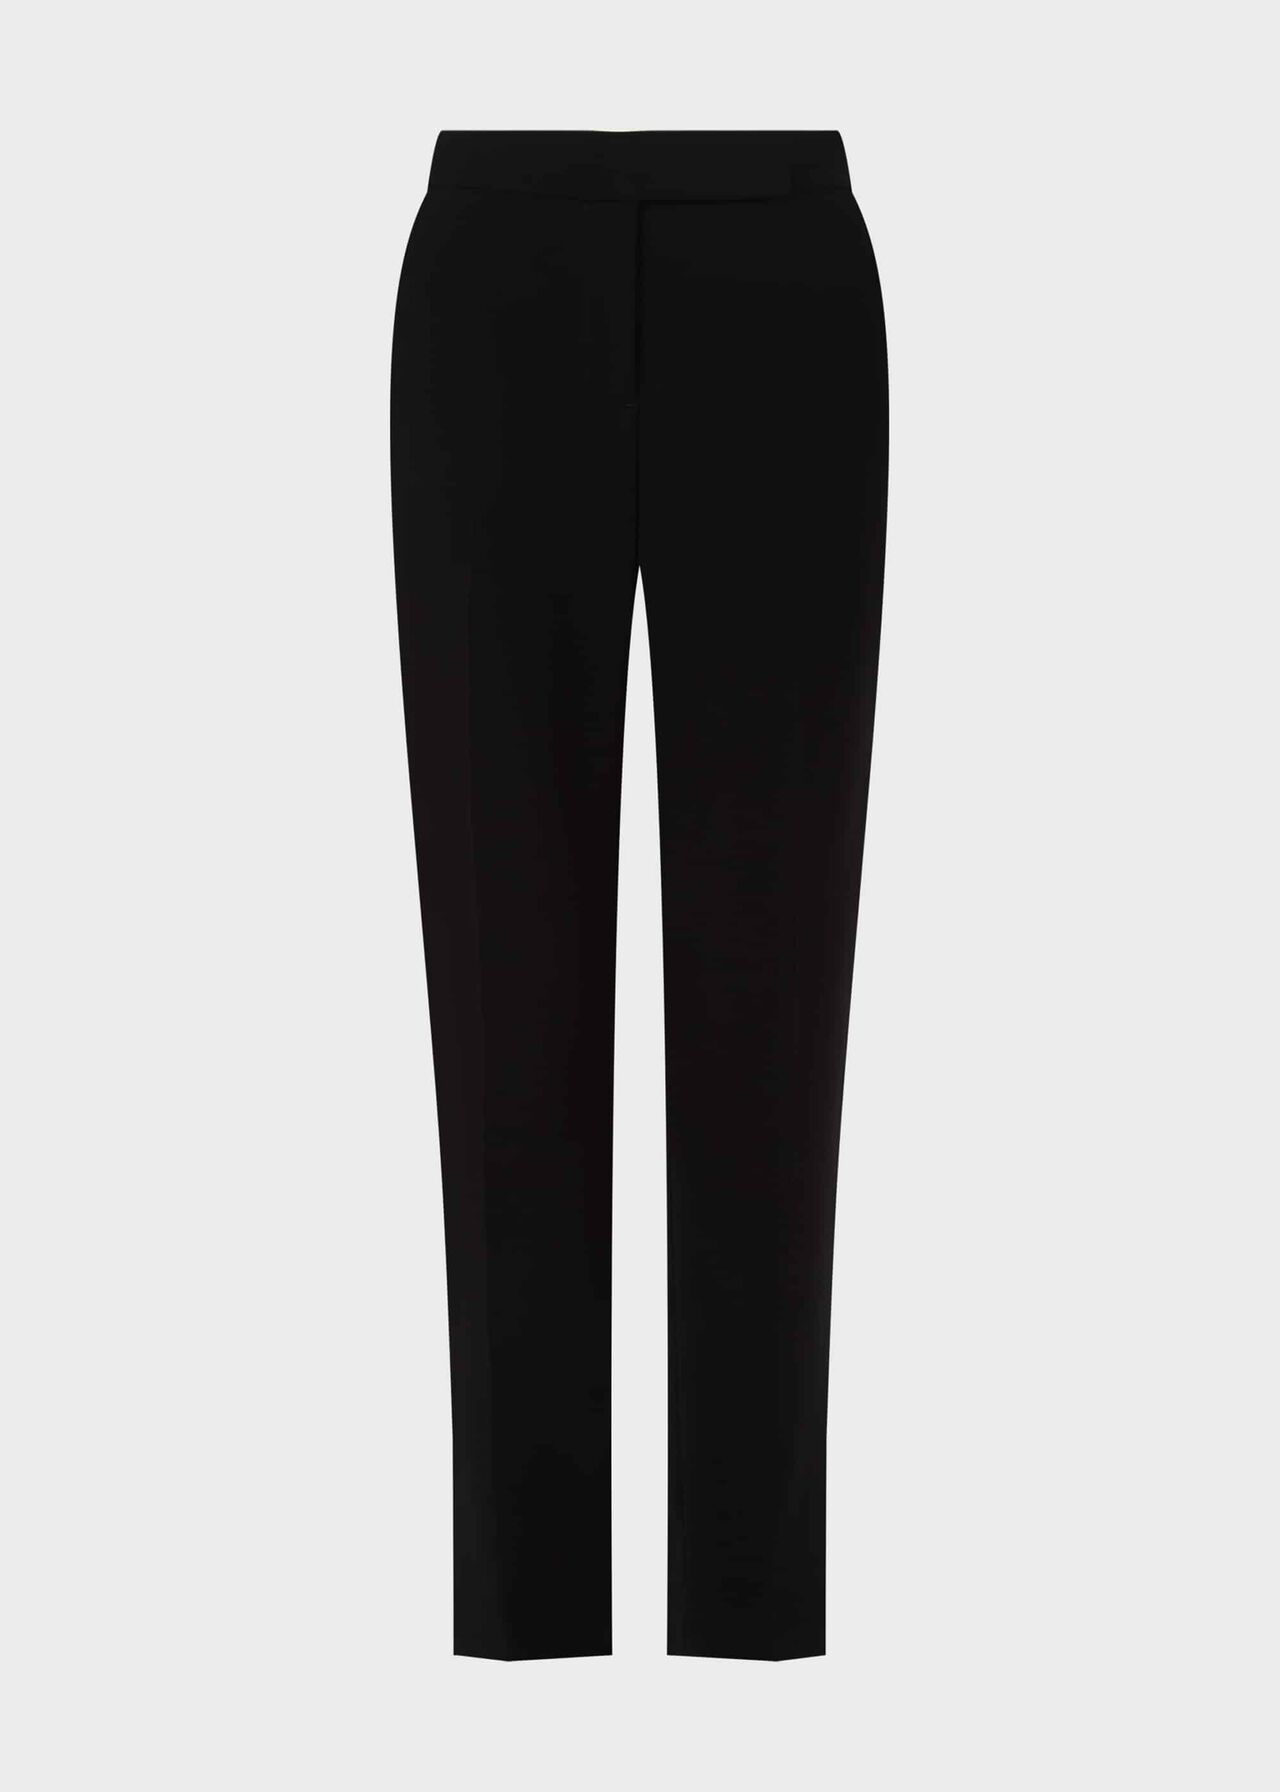 Petite Alva Tapered Trousers Black